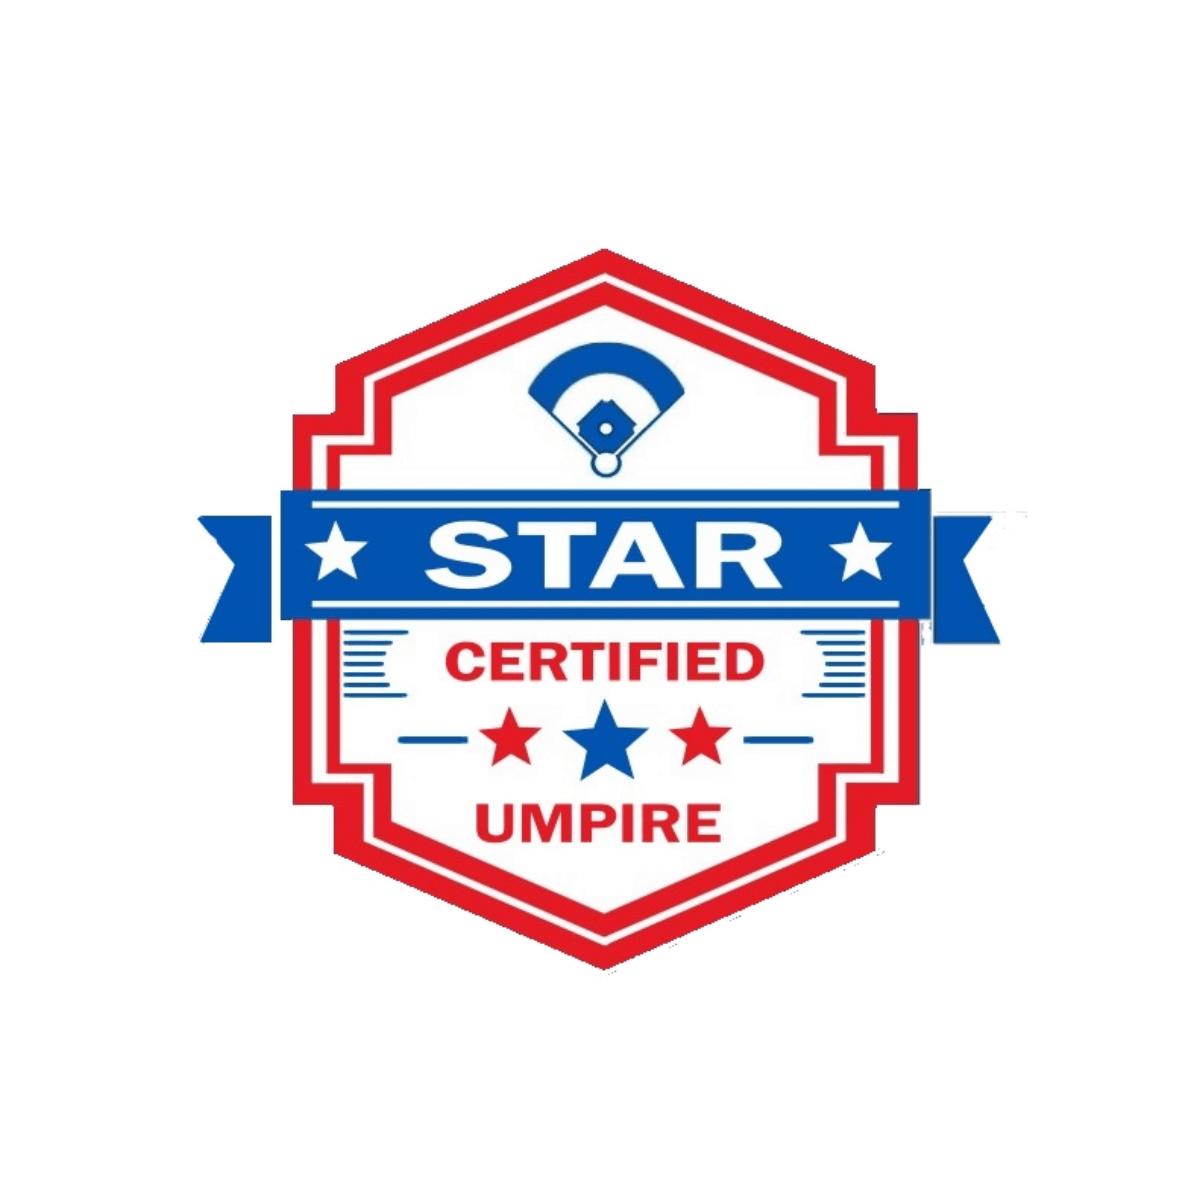 STAR Certificate - Umpire